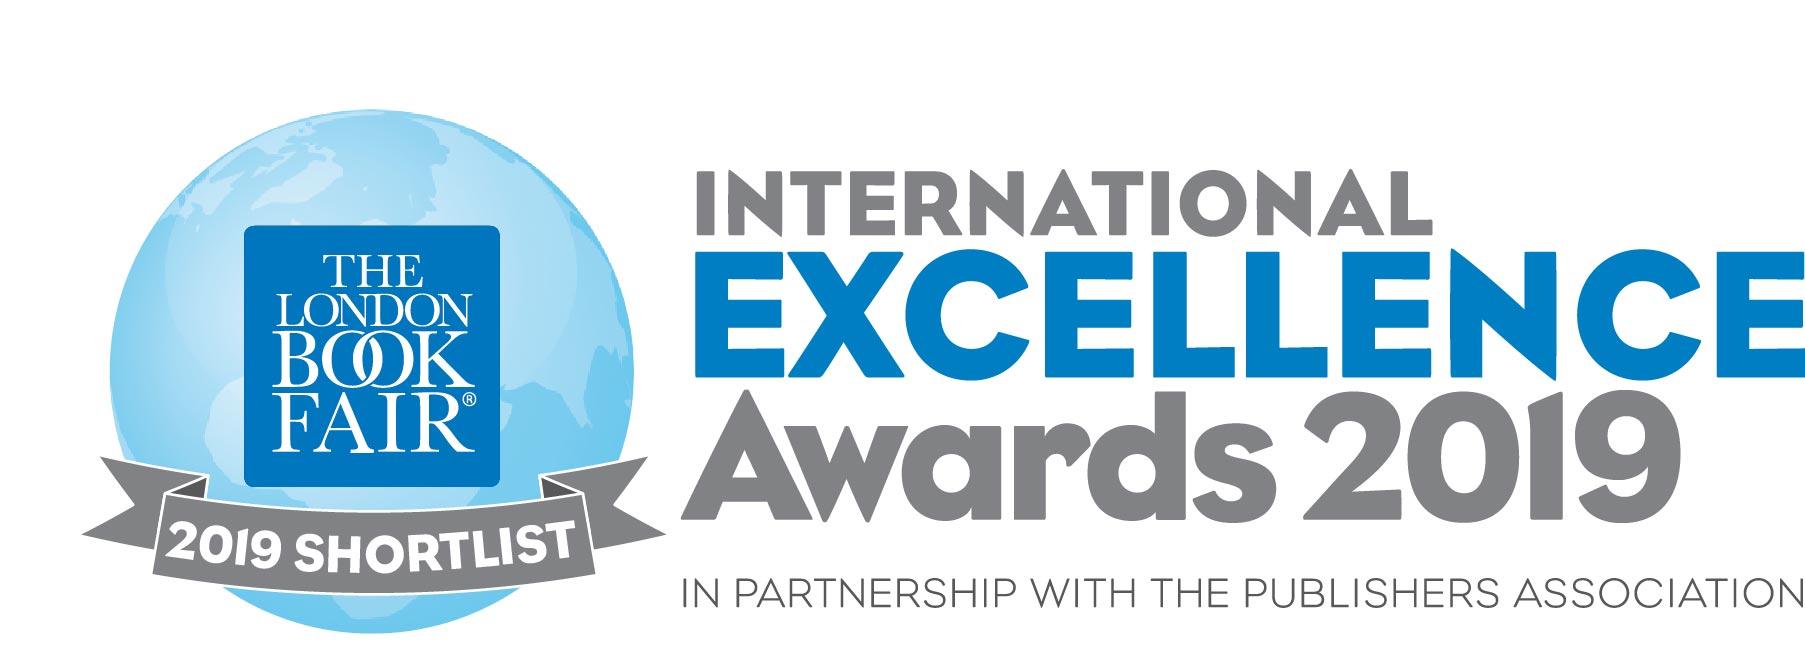 IEA_logo_2019_shortlist_horizontal